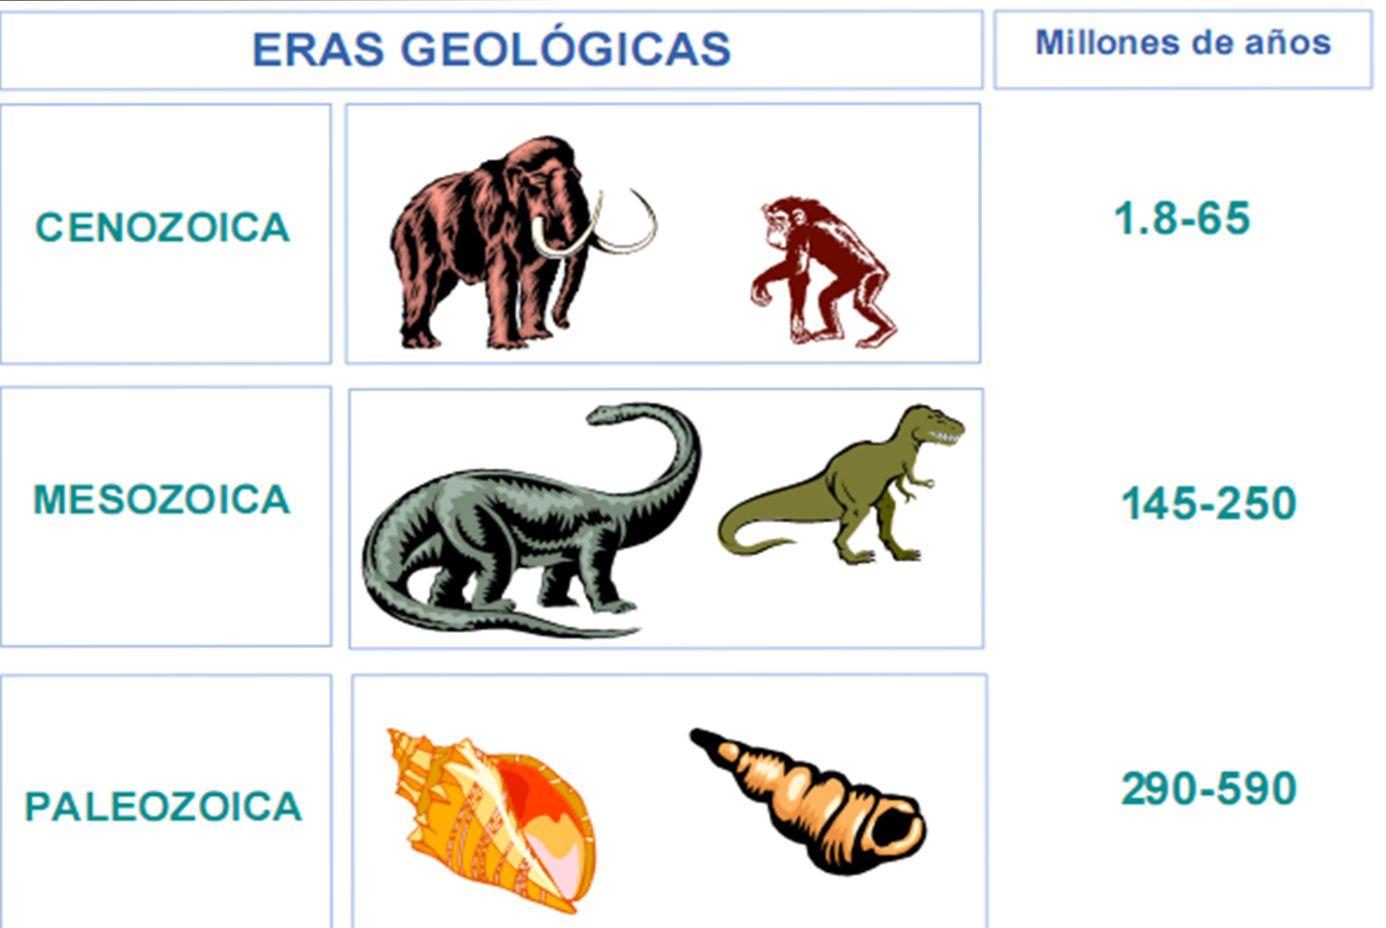 RADIO TIERRA VIVA !: Eras geológicas de la Tierra